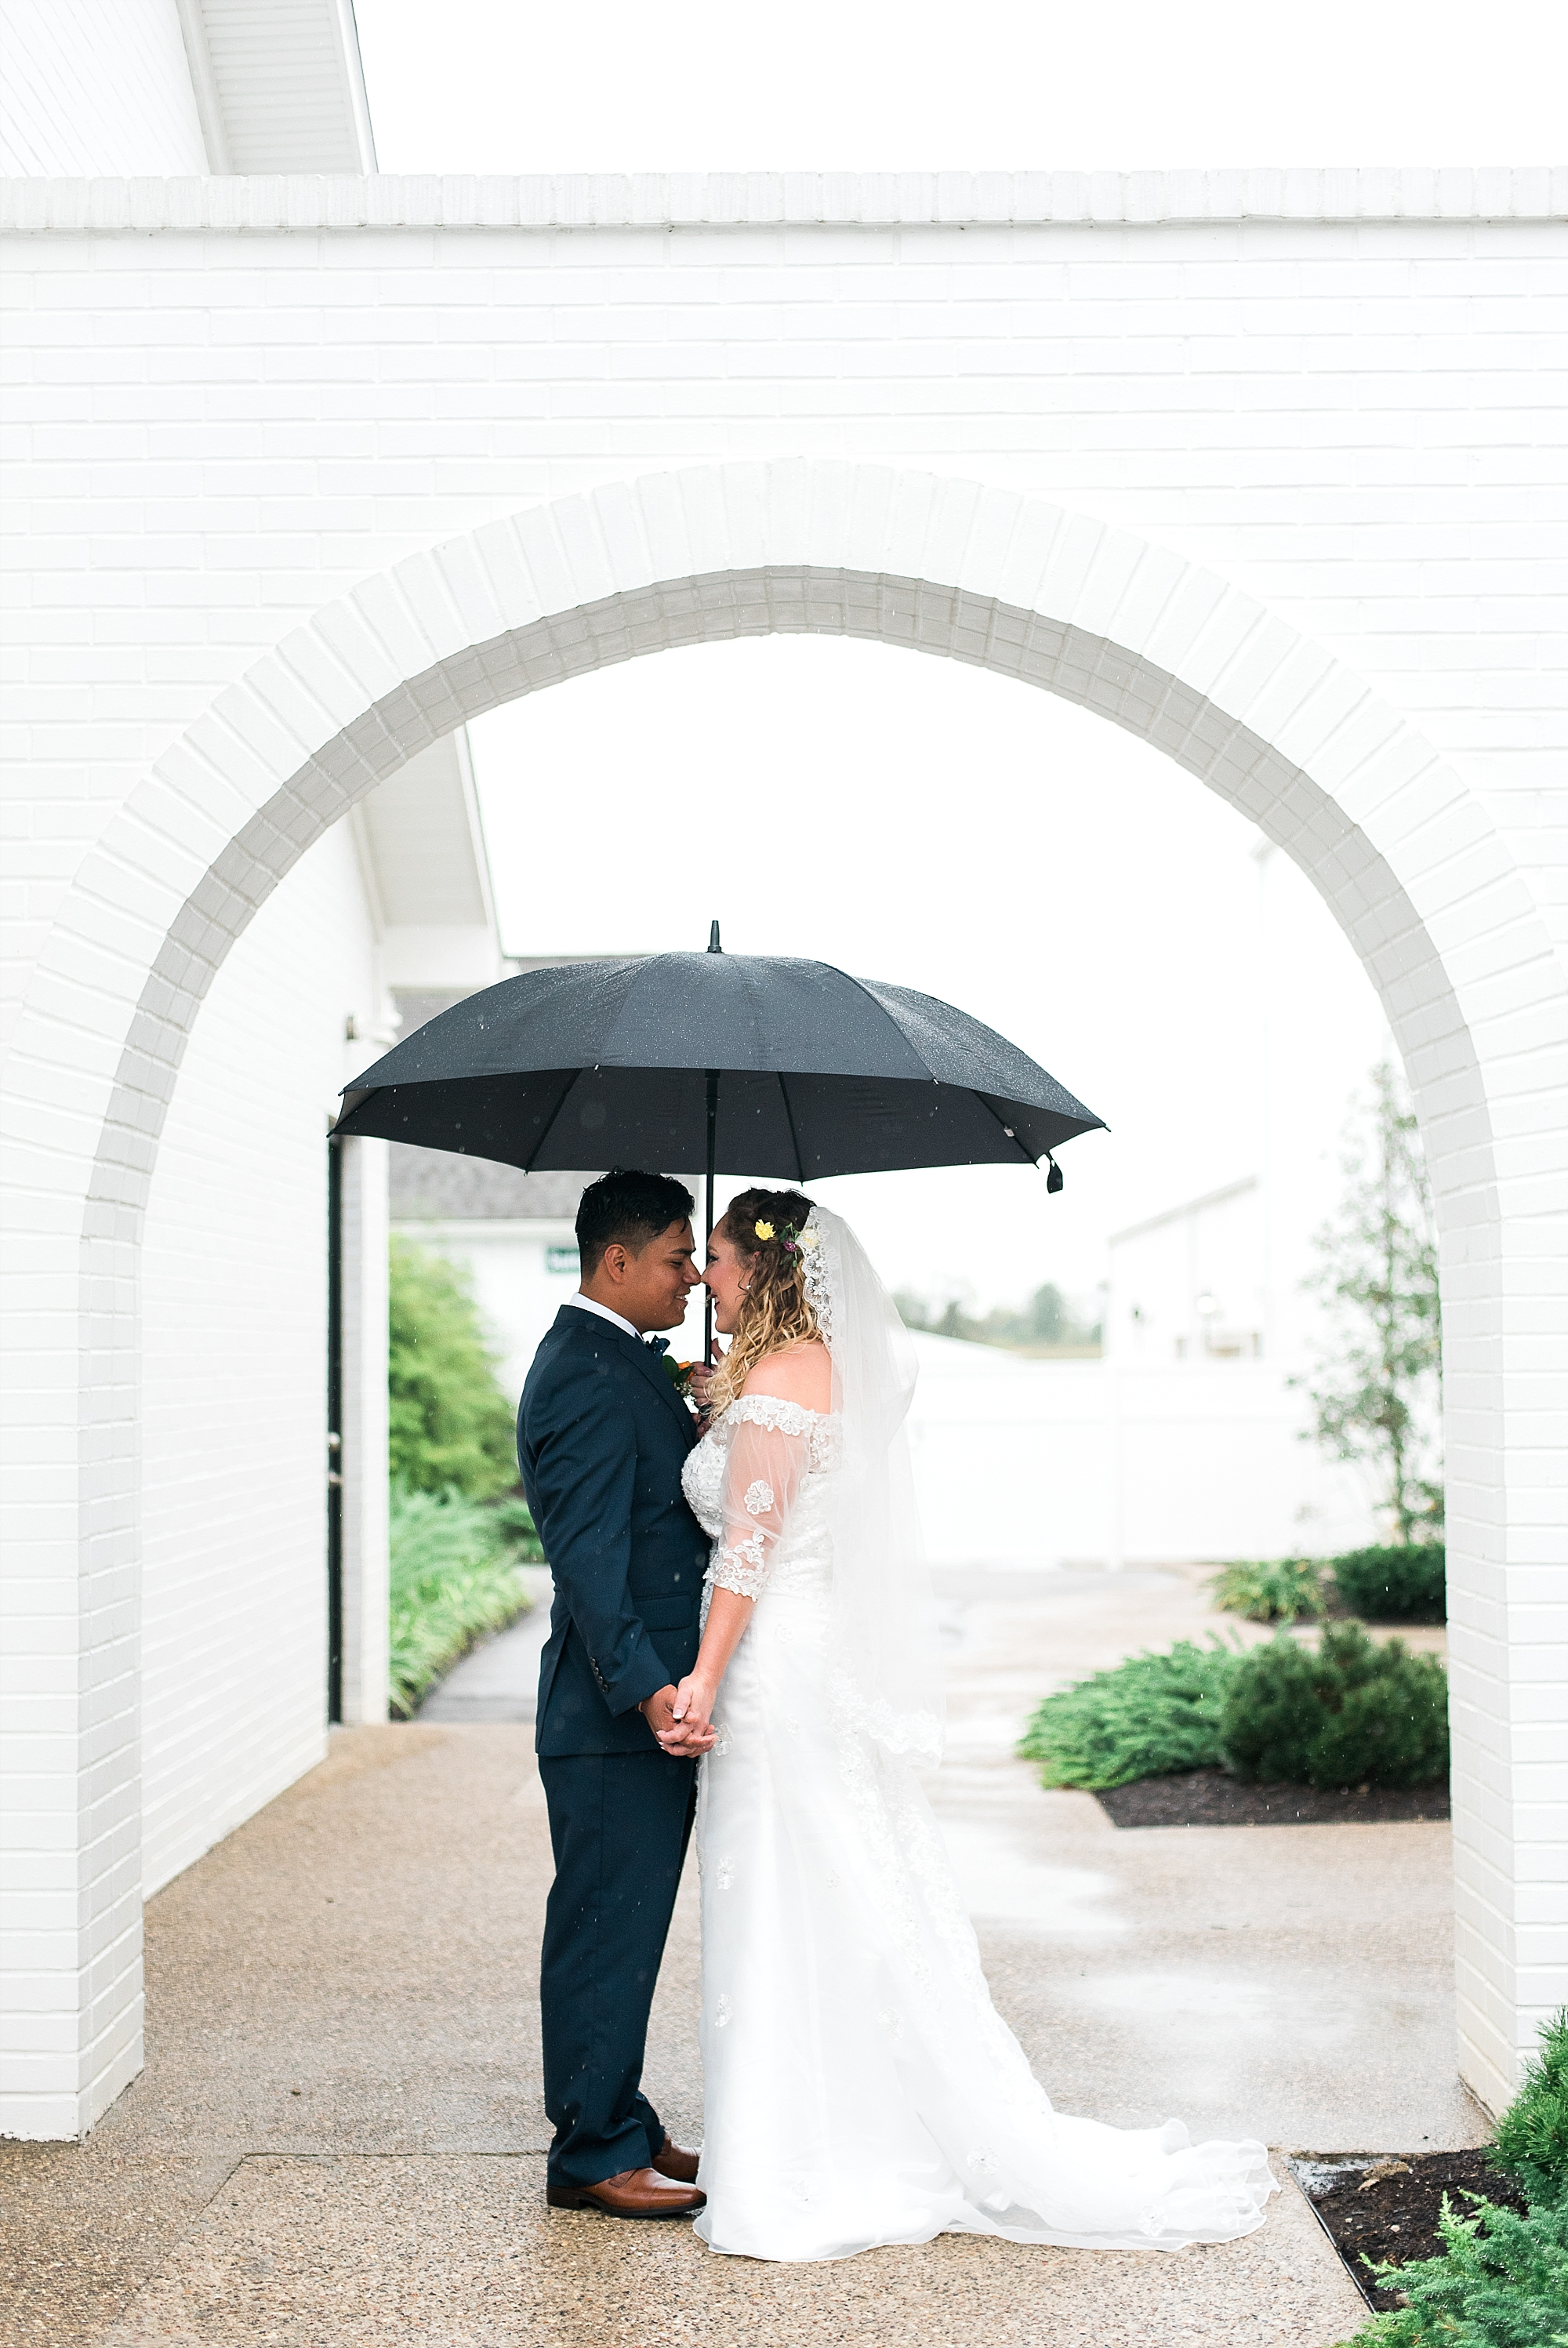 thoroughbred-center-wedding-receptions